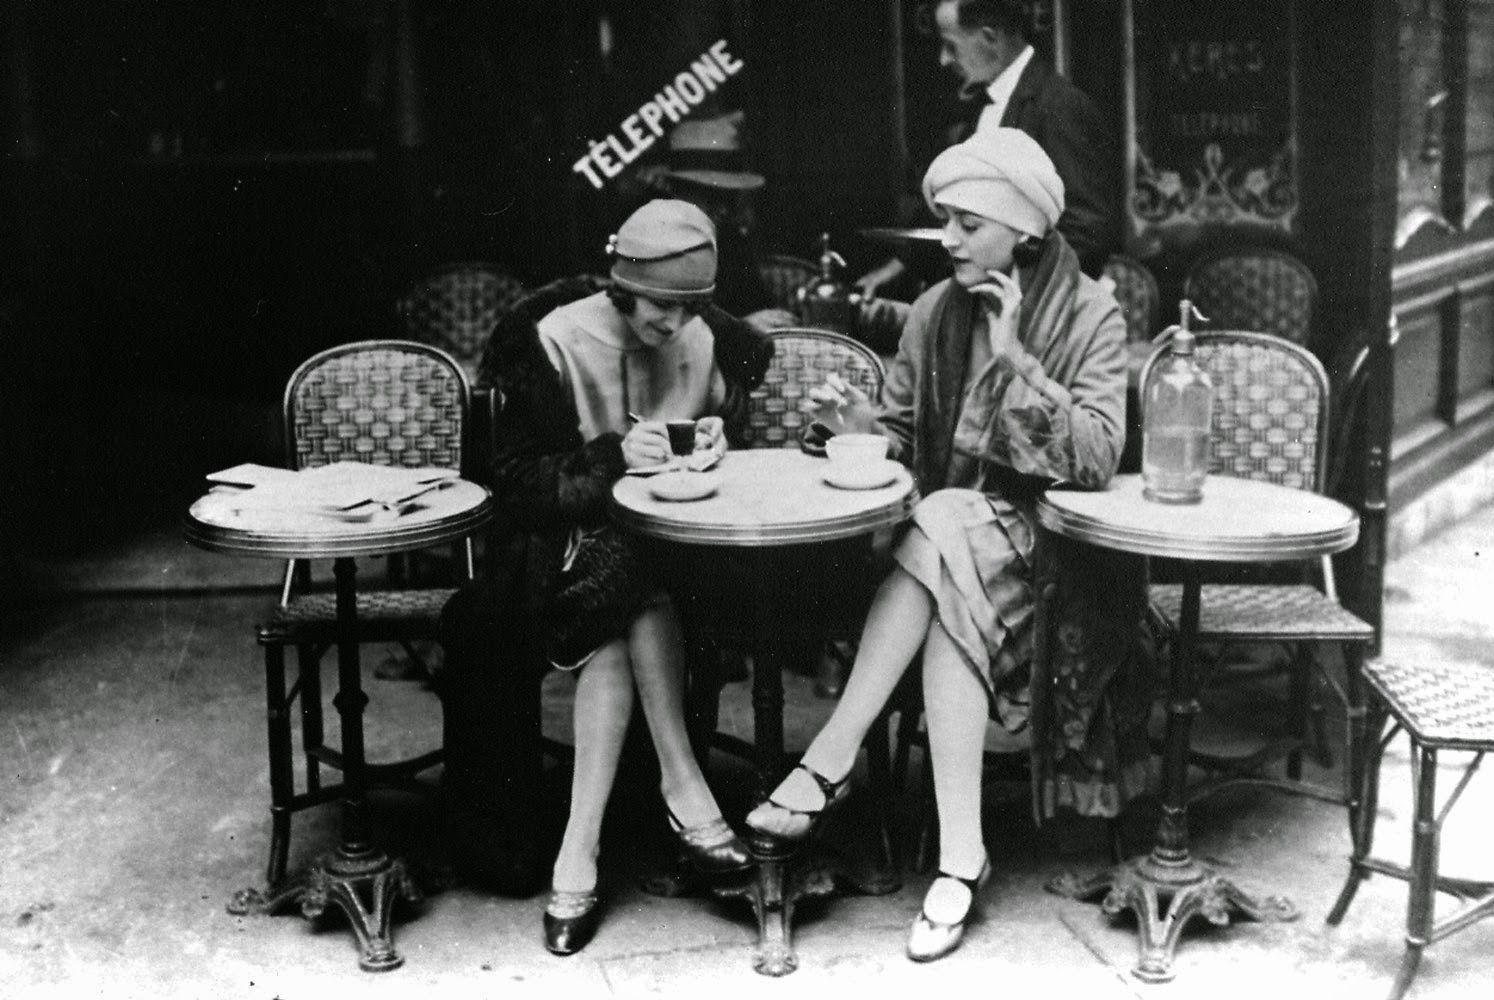 14-Lost-&-Found-Gallery-GalleryLF-Black-&-White-Vintage-Photography-www-designstack-co